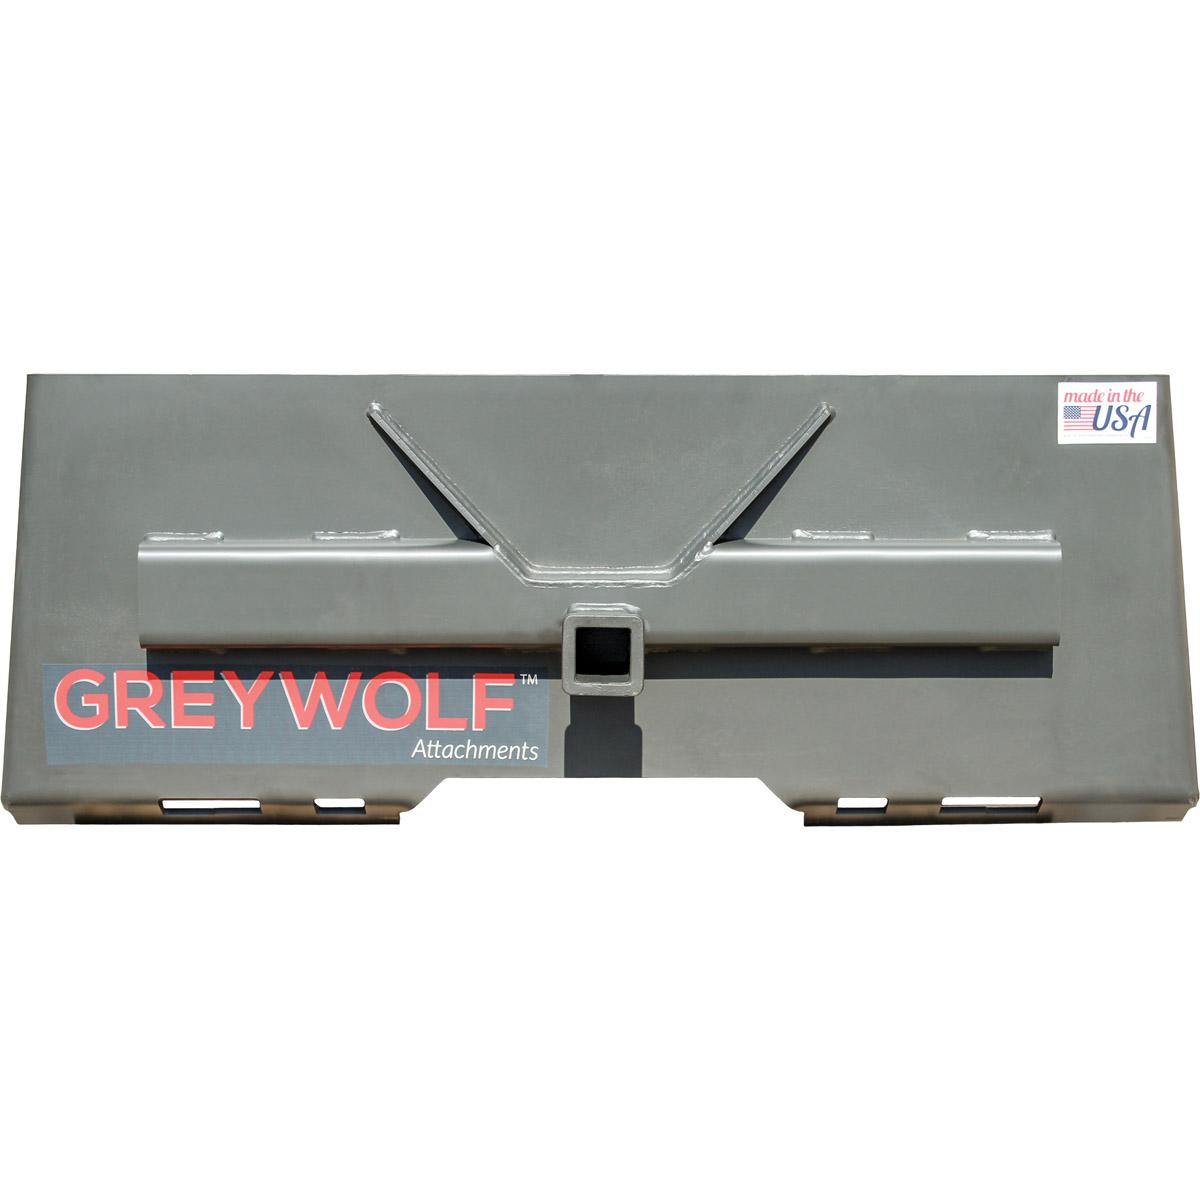 "GreyWolf 2"" Receiver Hitch Skid Steer Attachment"